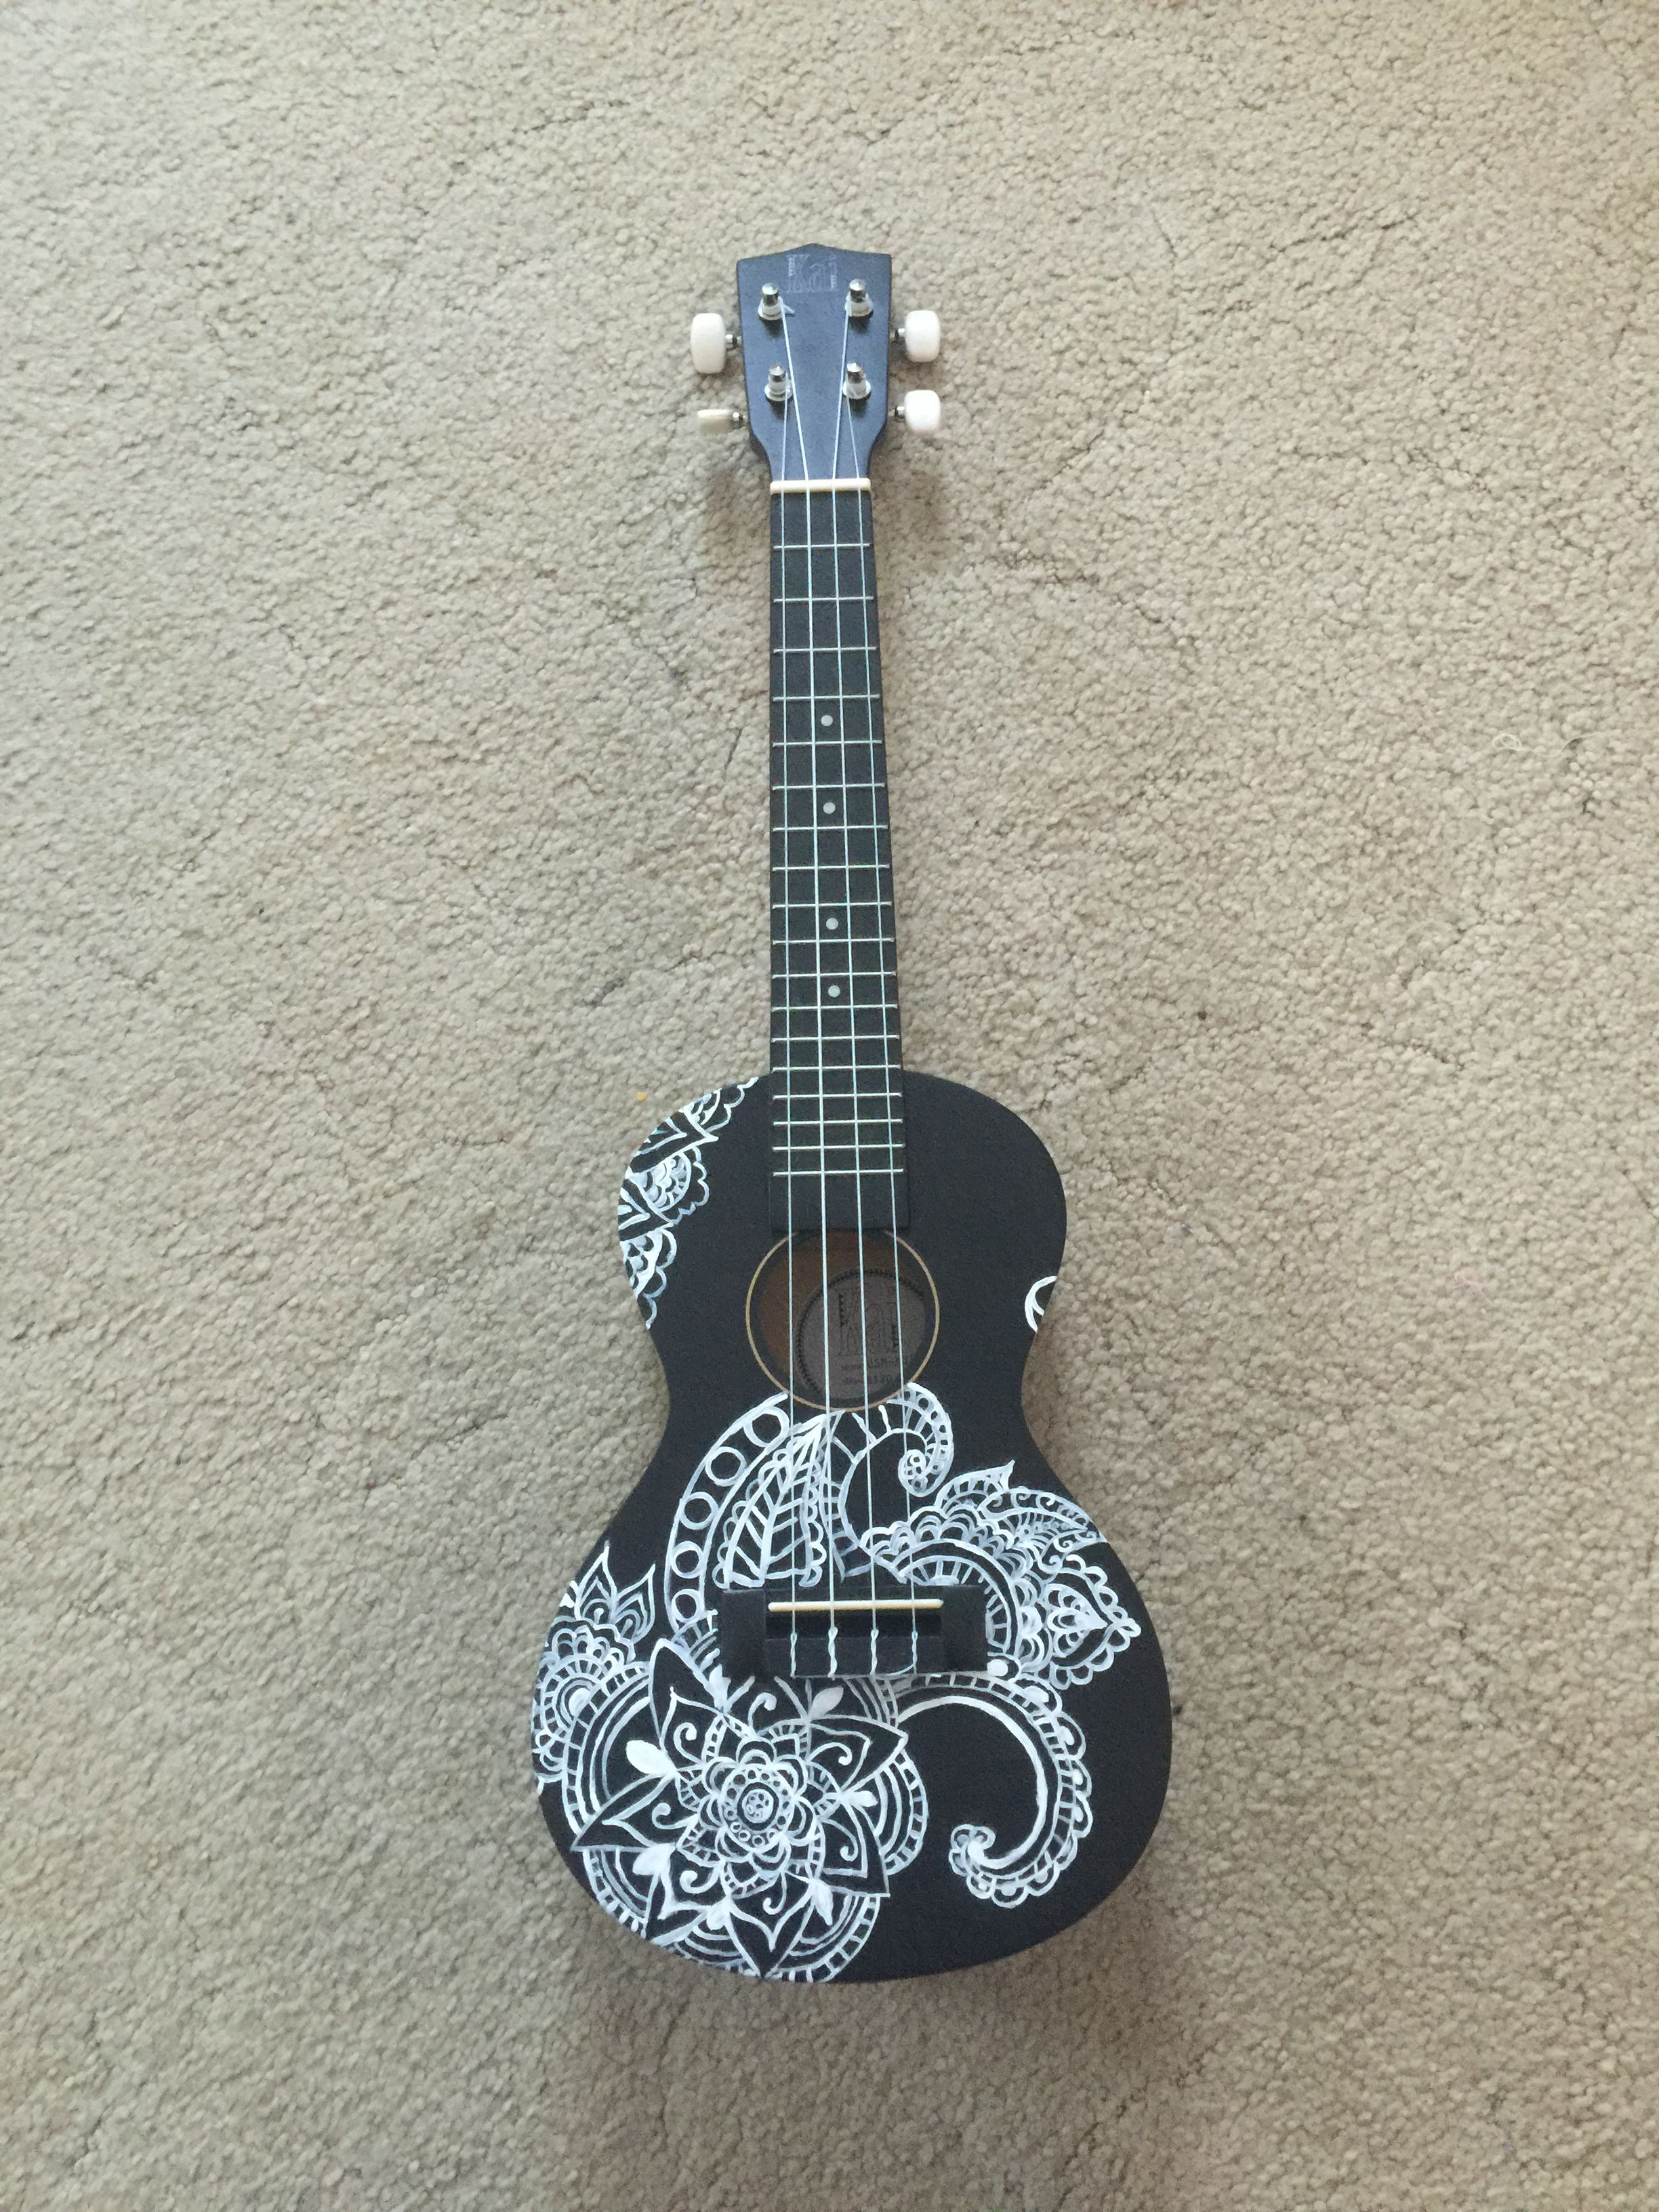 pinterest// sarahmotavator   ukulele vibes   Pinterest ... Ukulele Paint Designs